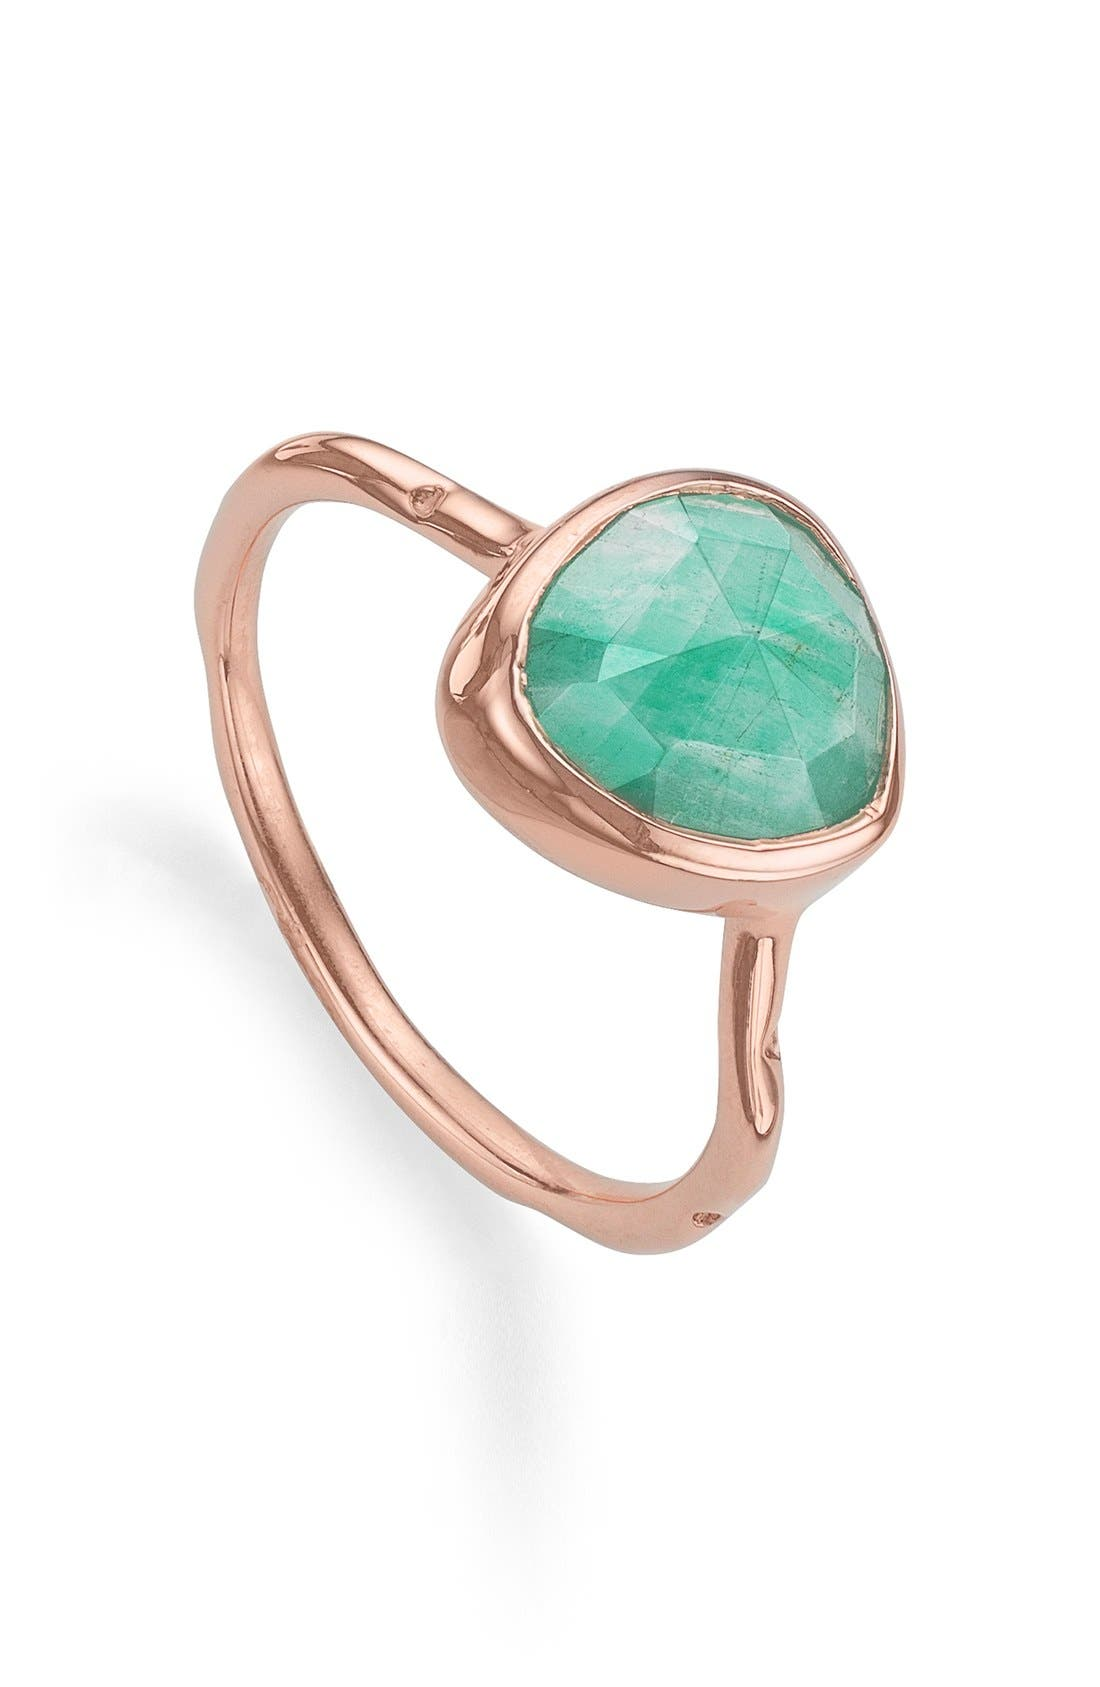 Siren Semiprecious Stone Stacking Ring,                             Main thumbnail 1, color,                             ROSE GOLD/ AMAZONITE